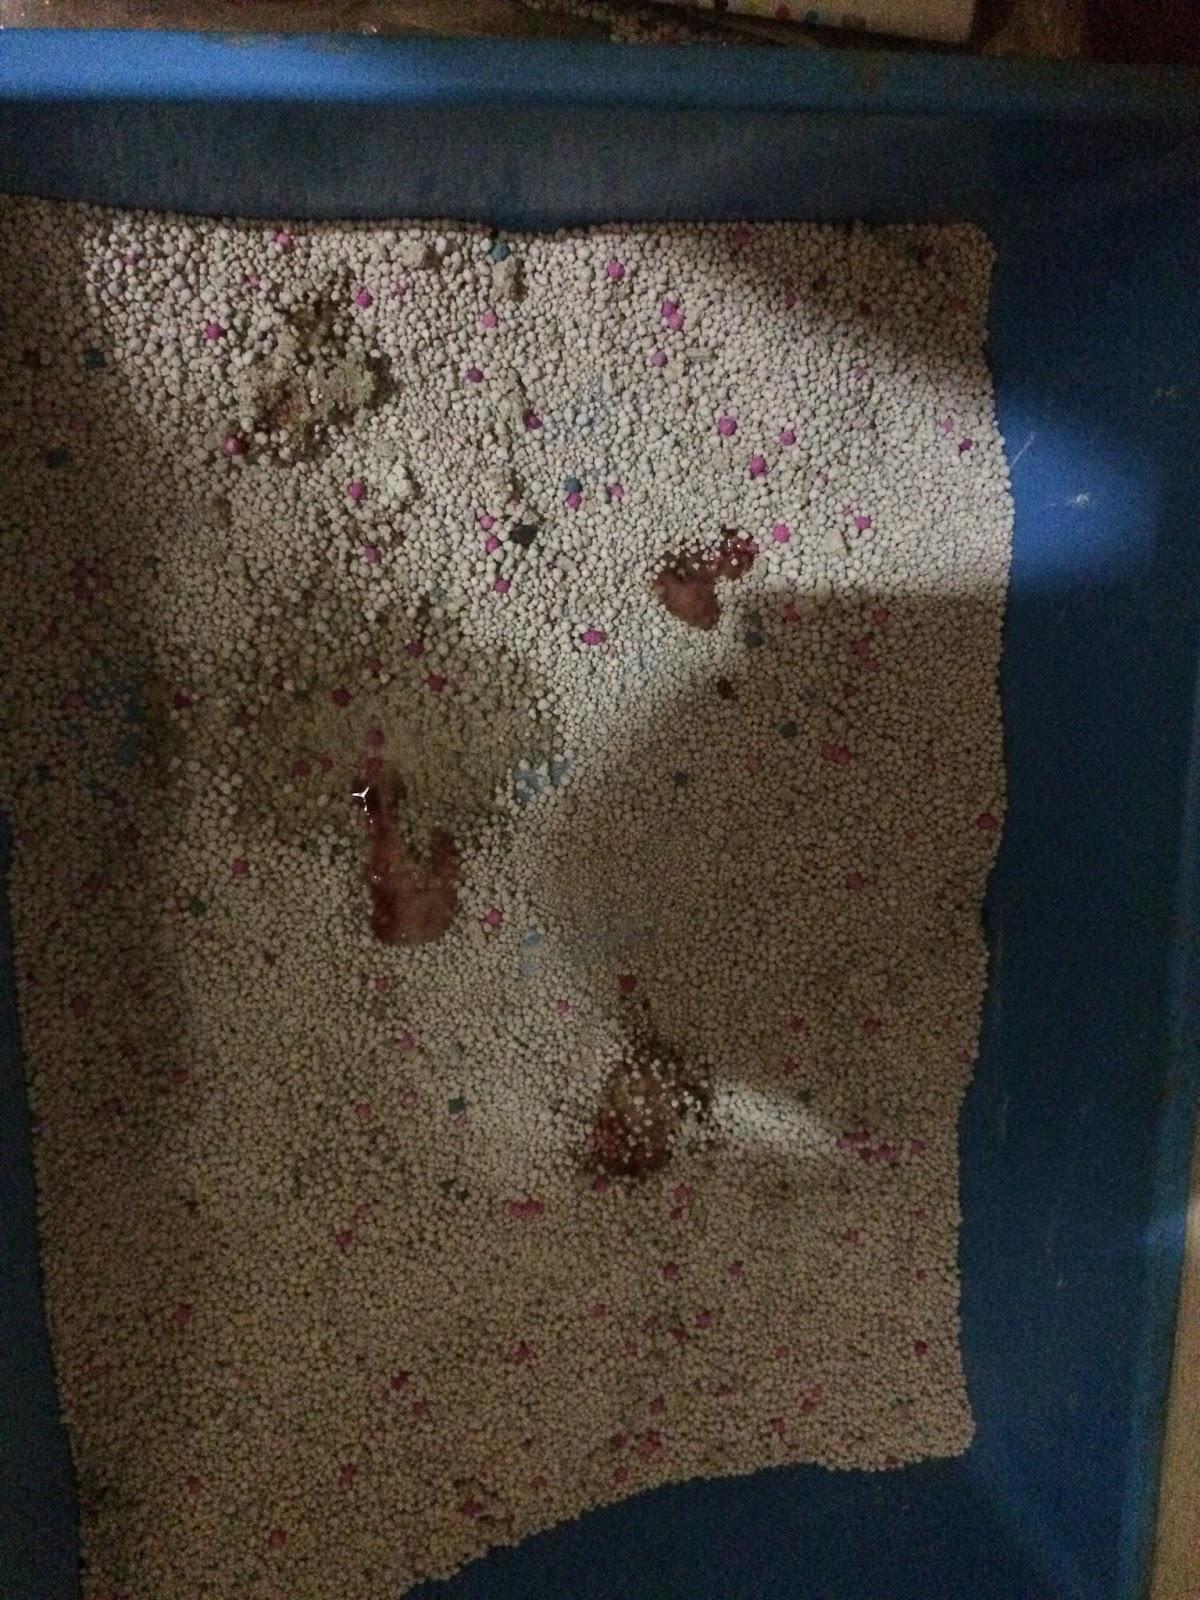 Kucing cirit birit berdarah